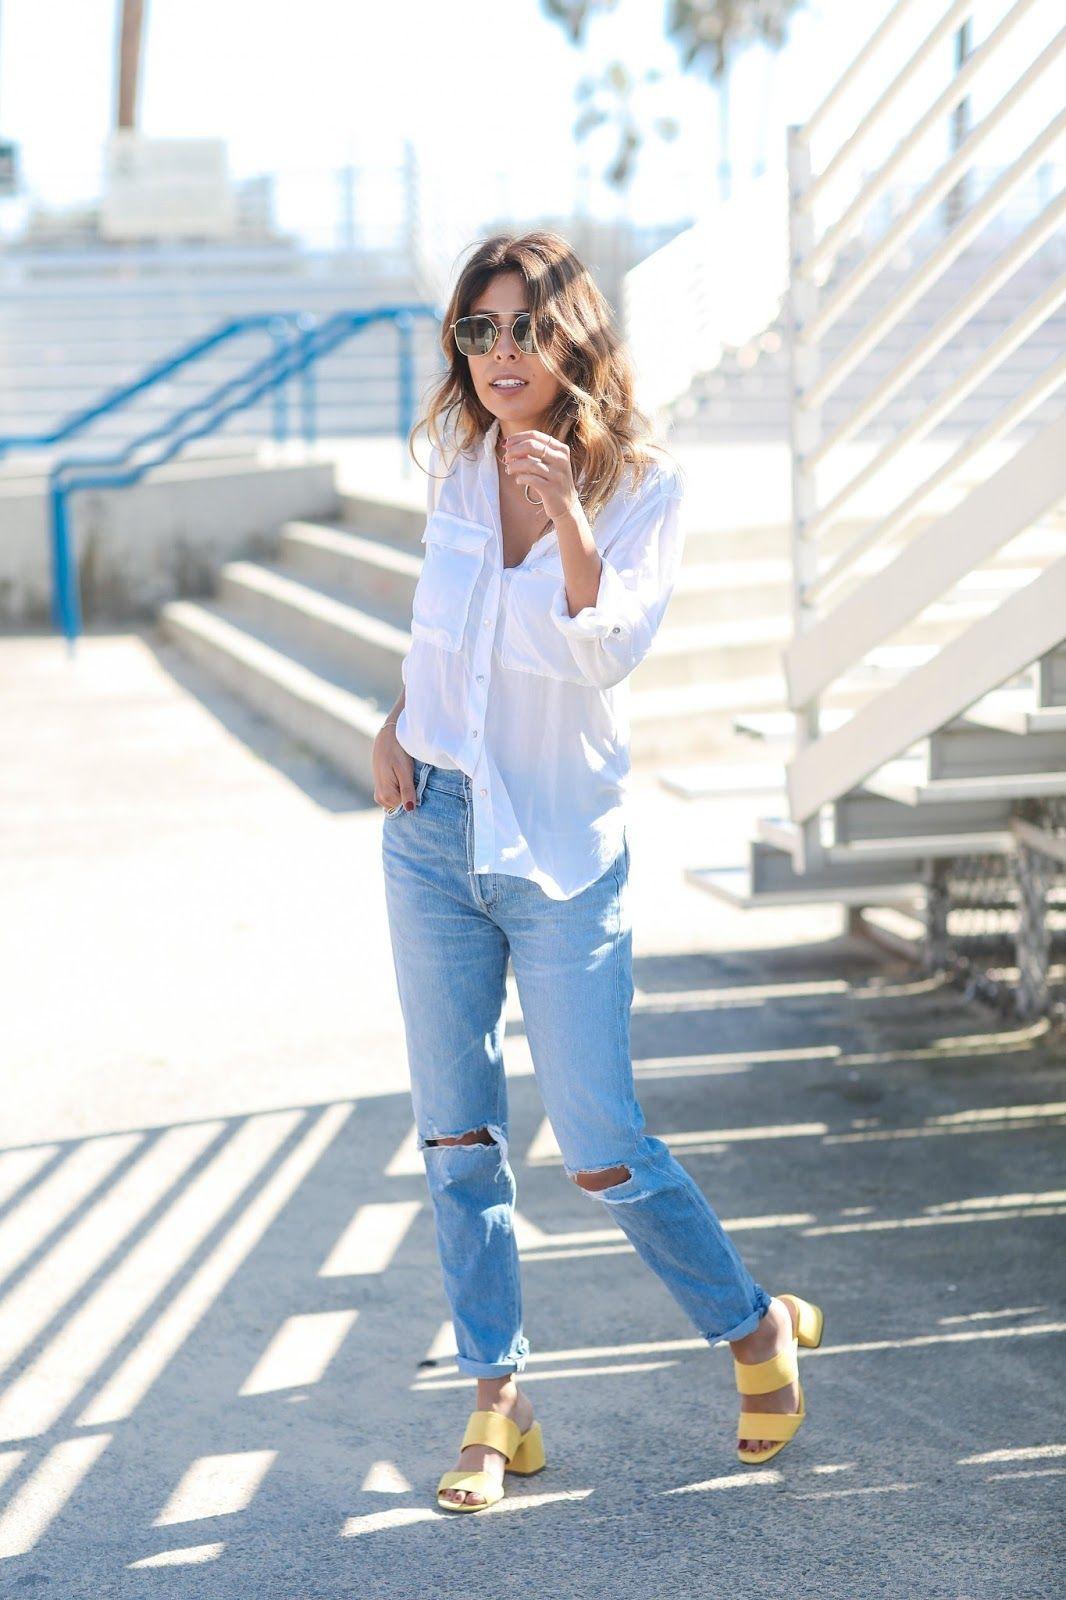 Buy How to mustard wear yellow heels picture trends